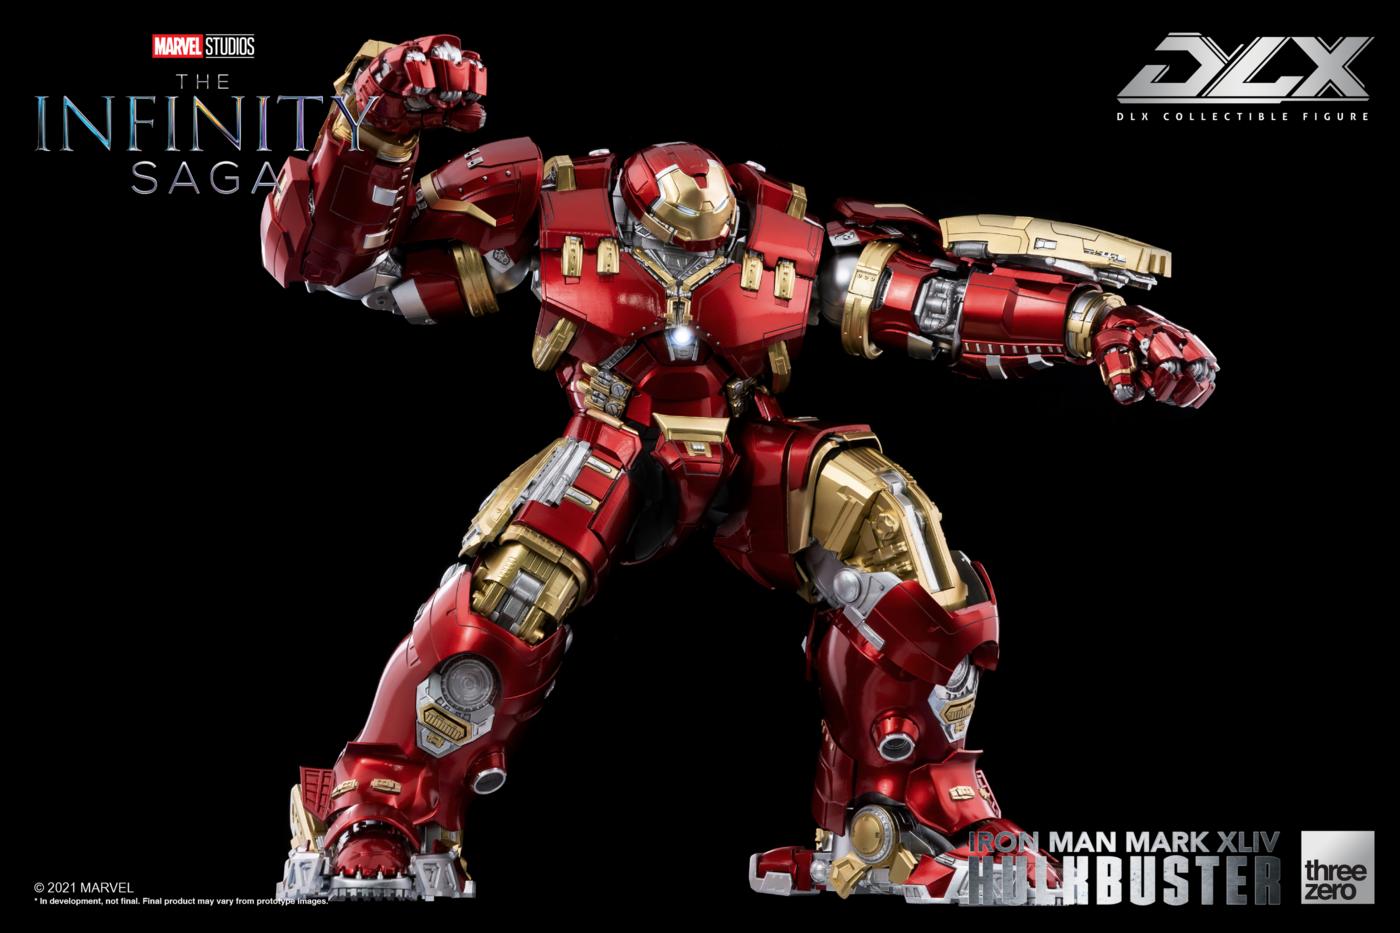 Marvel - The Infinity Saga - Iron Man MK44 Hulkbuster Deluxe 1/12 Scale Action Figure